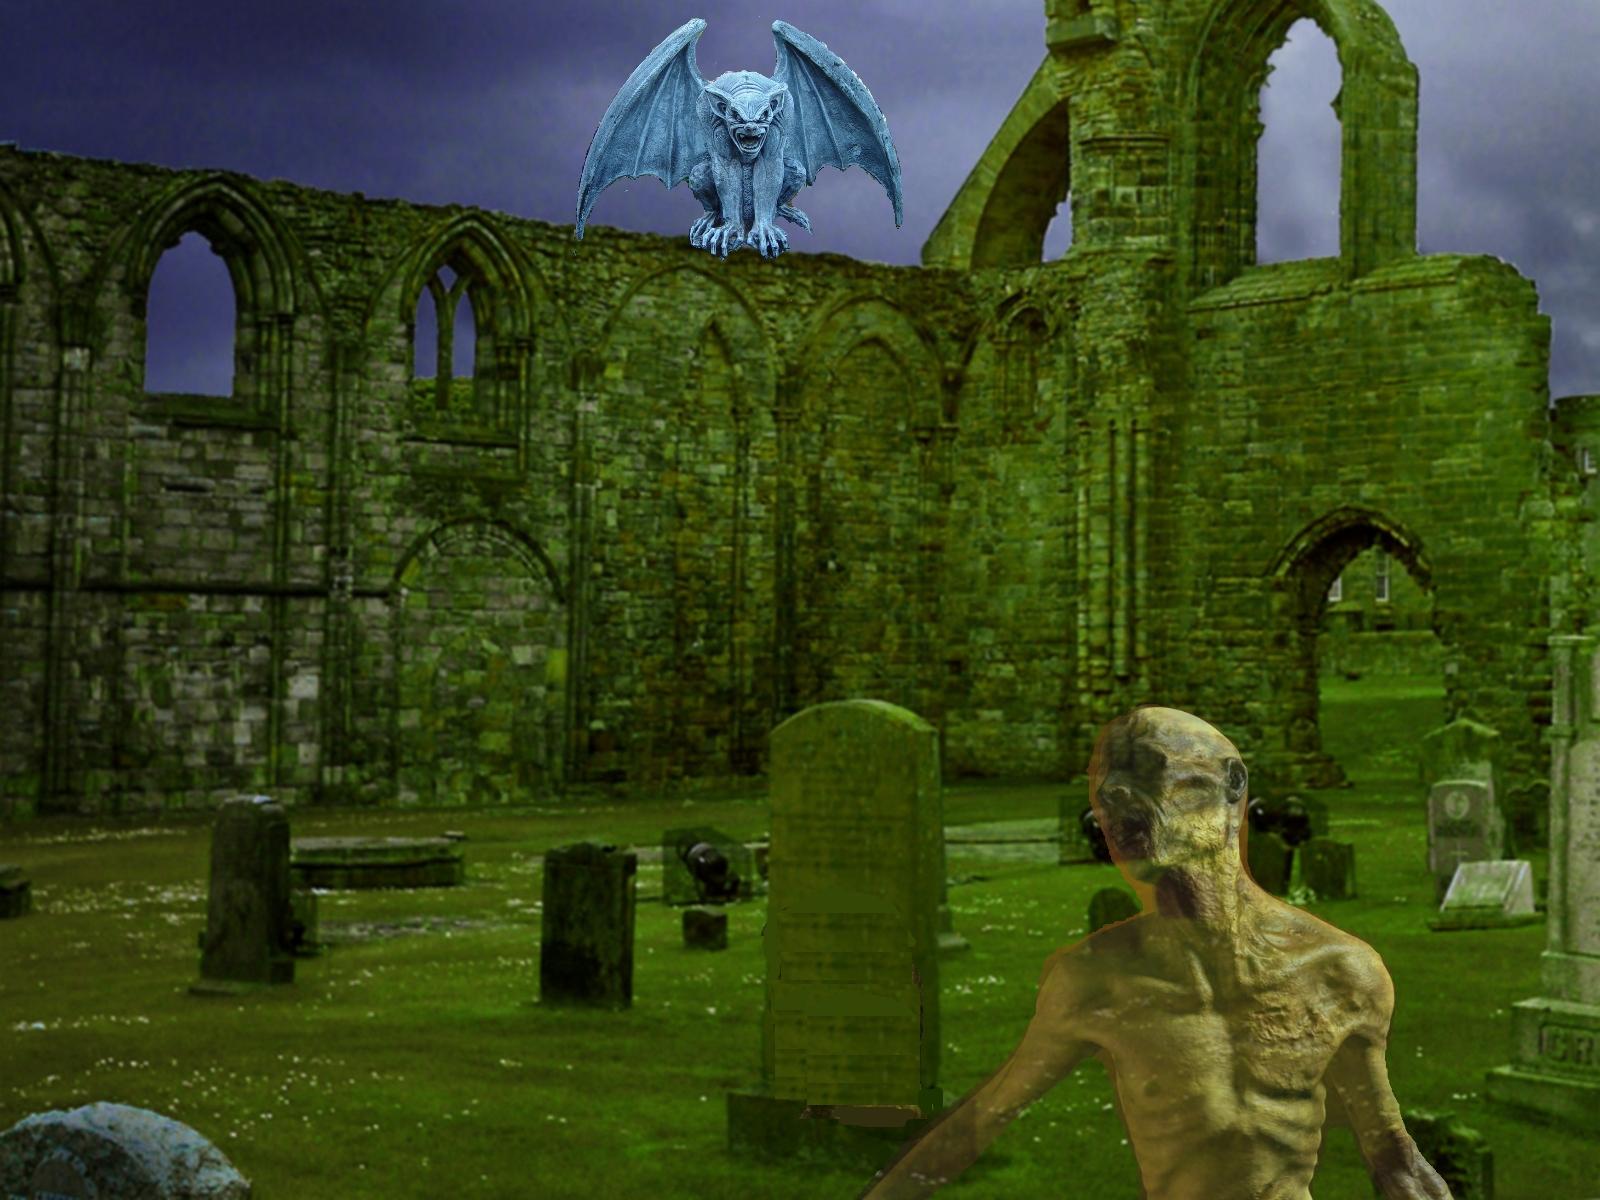 http://2.bp.blogspot.com/-fKCYkw8qtHY/UB_nSRxO-7I/AAAAAAAASZY/hgiG6K6BmwI/s1600/gothic-graveyard.jpg